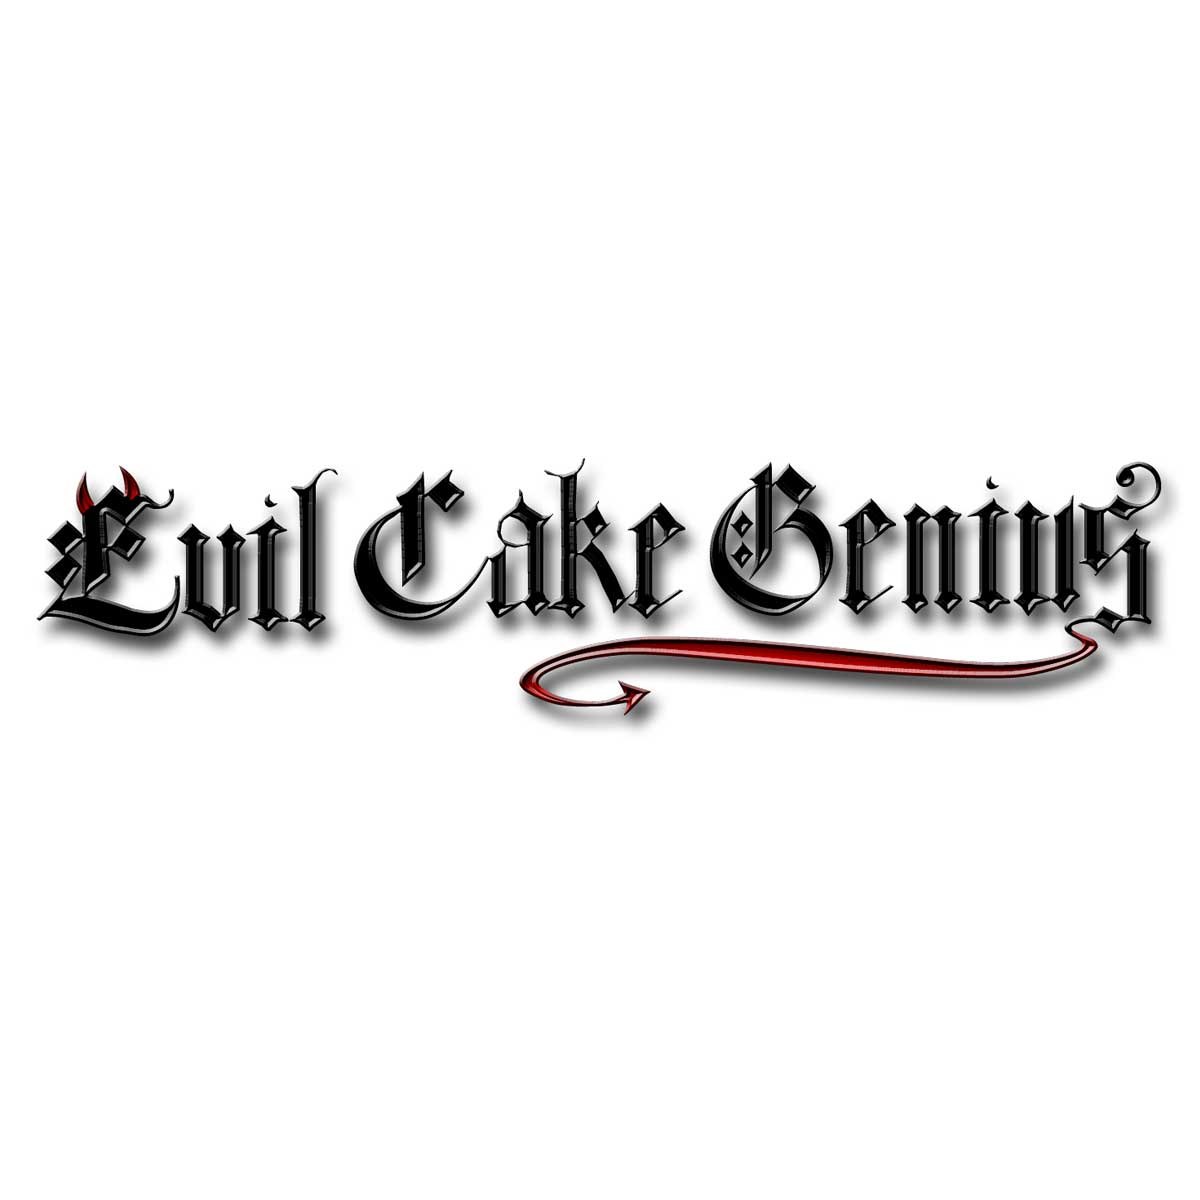 Impression Mat Confetti Already Evil Cake Genius